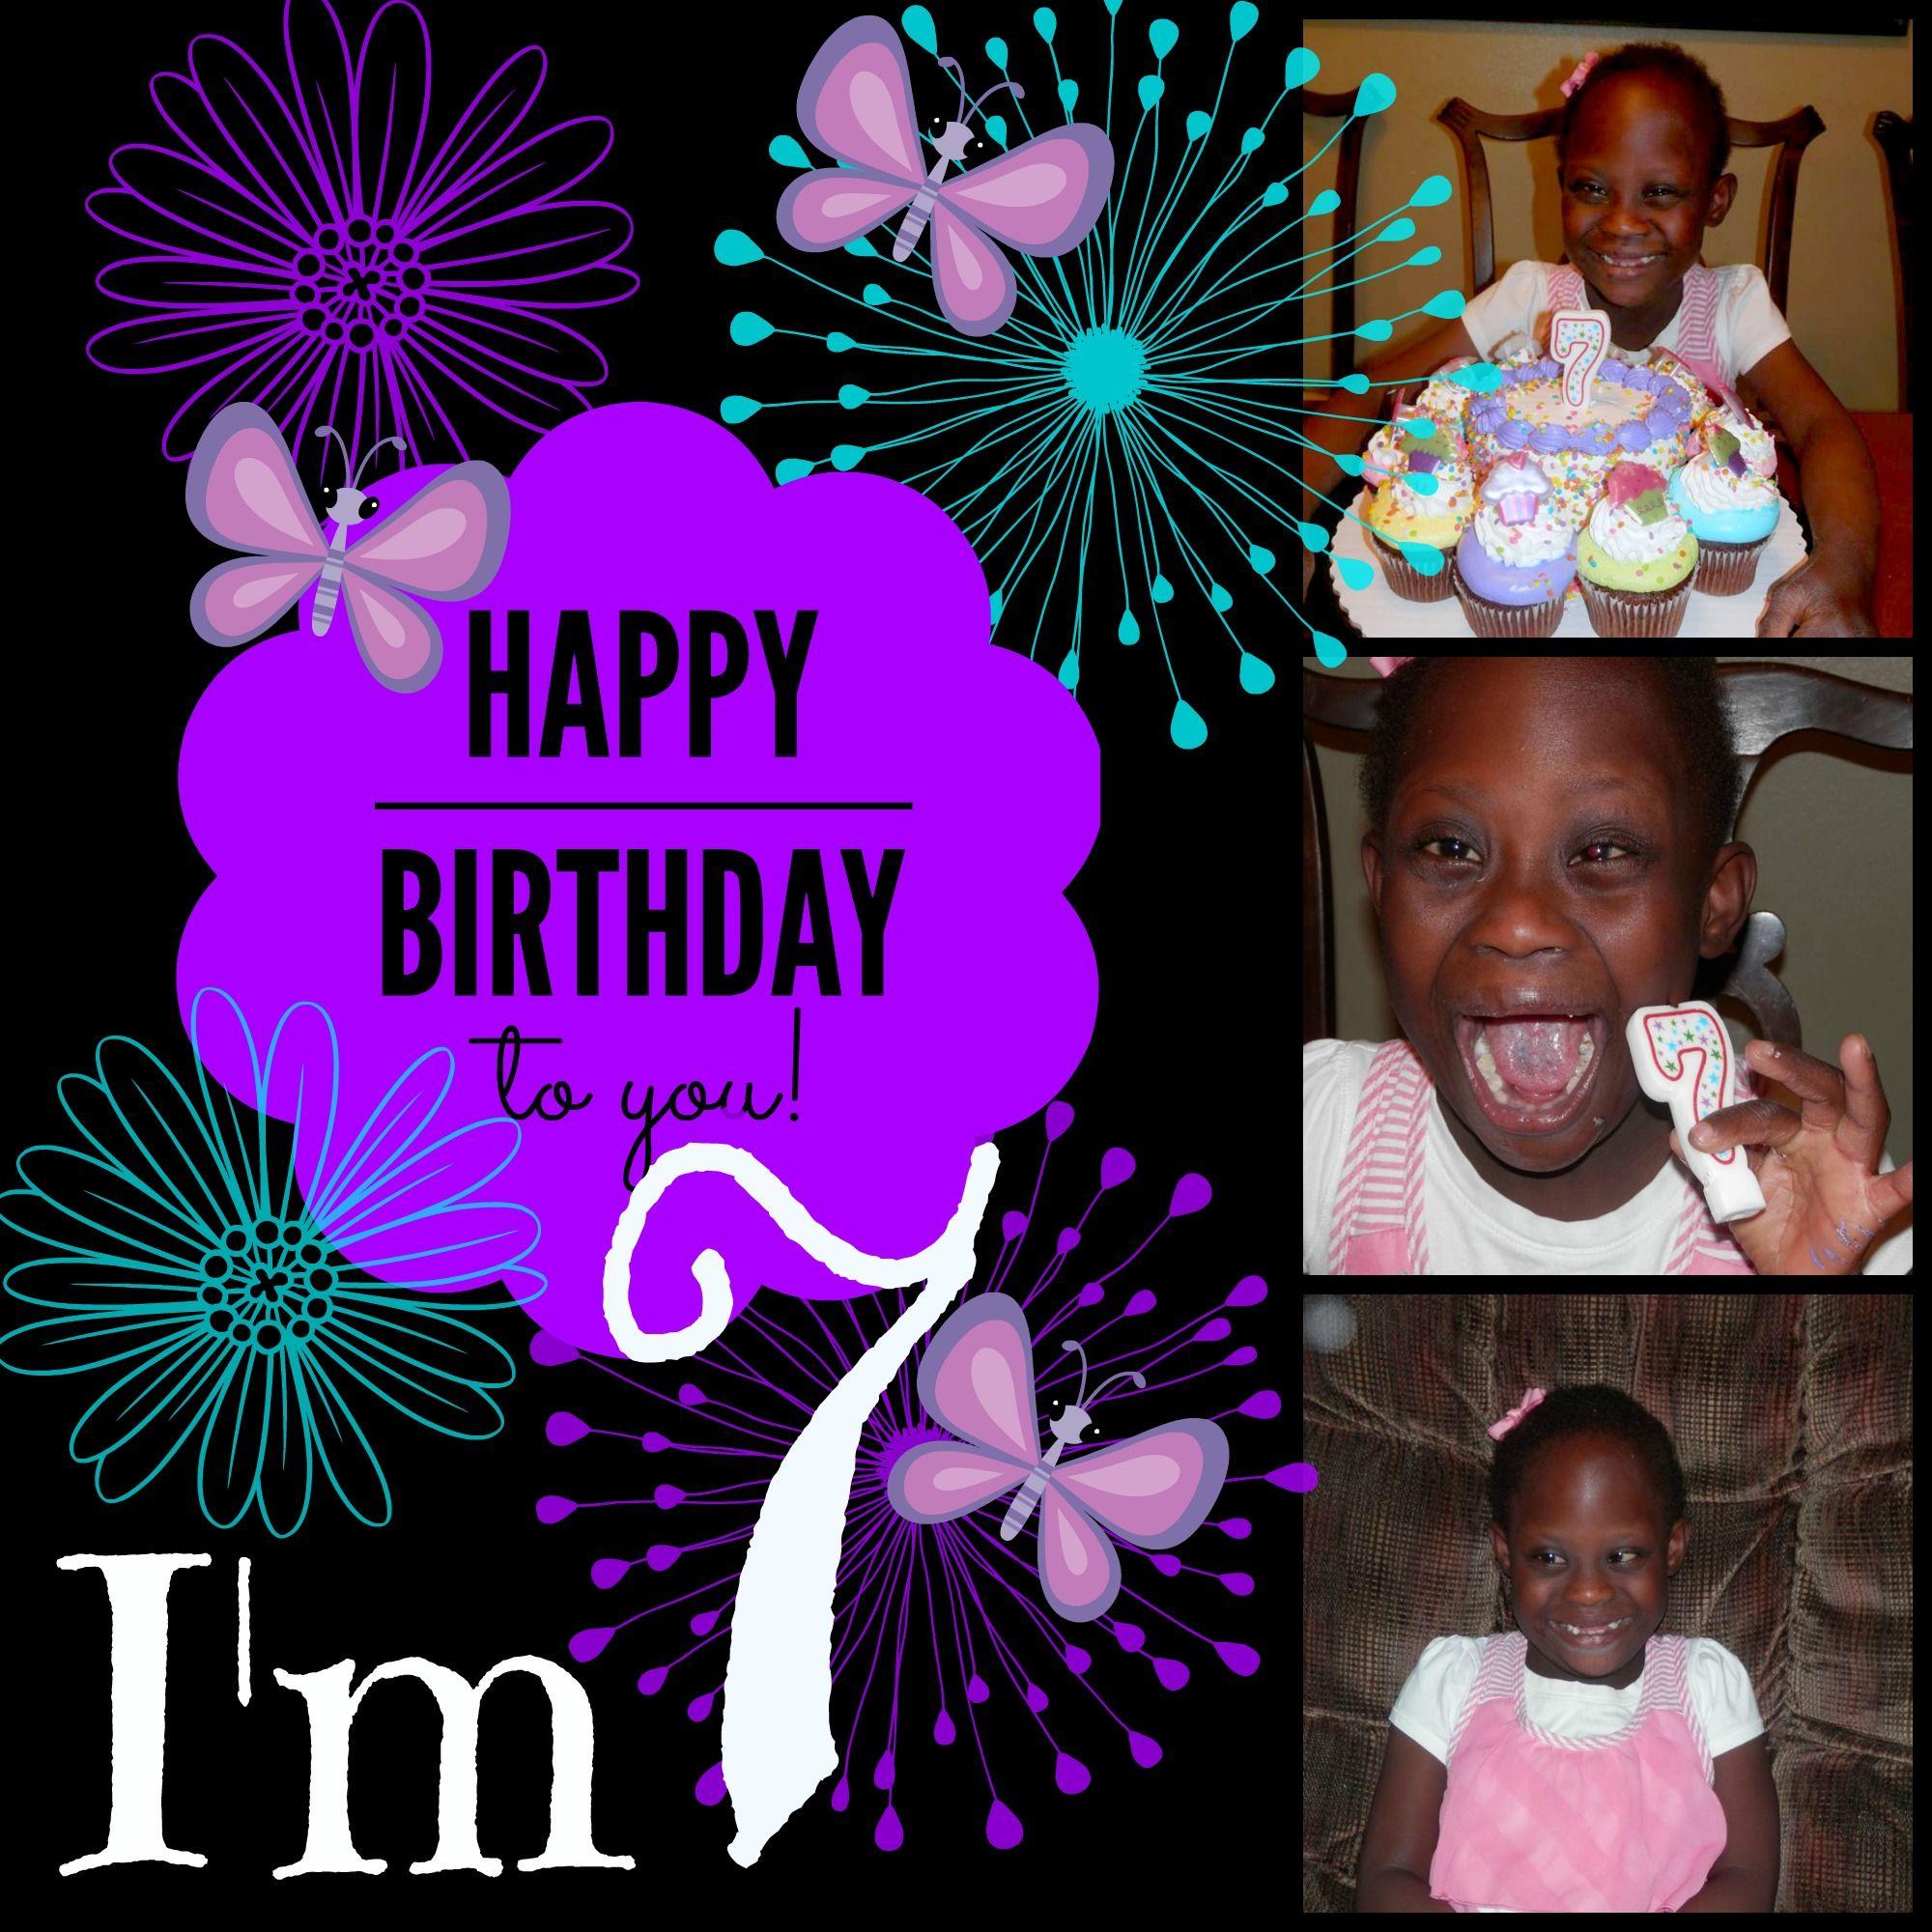 She's 7 Big Girl Years Old! Happy Birthday BKB!!